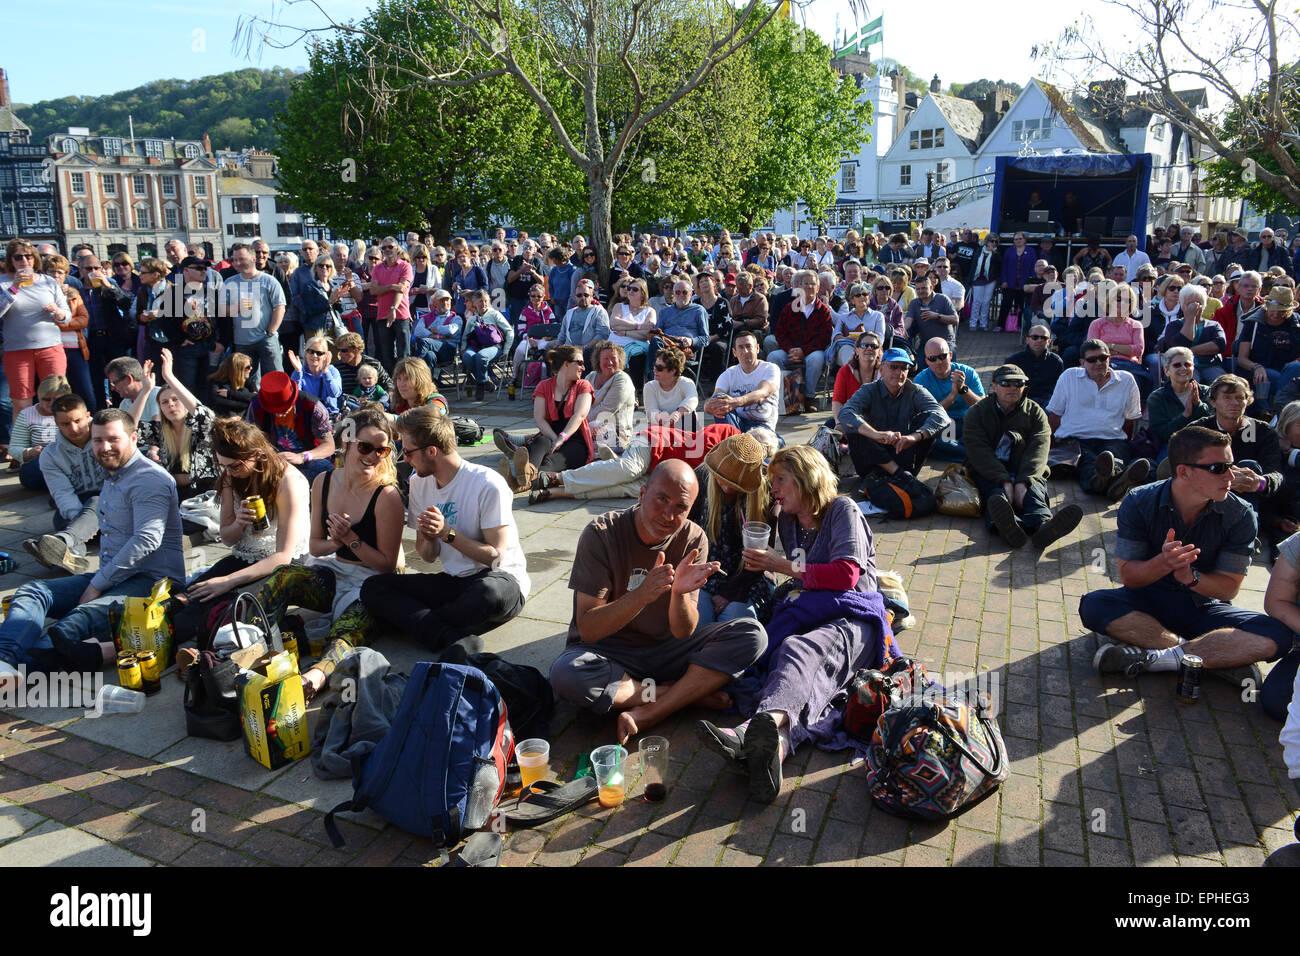 Dart Music Festival at Dartmouth Devon Uk 2015 - Stock Image